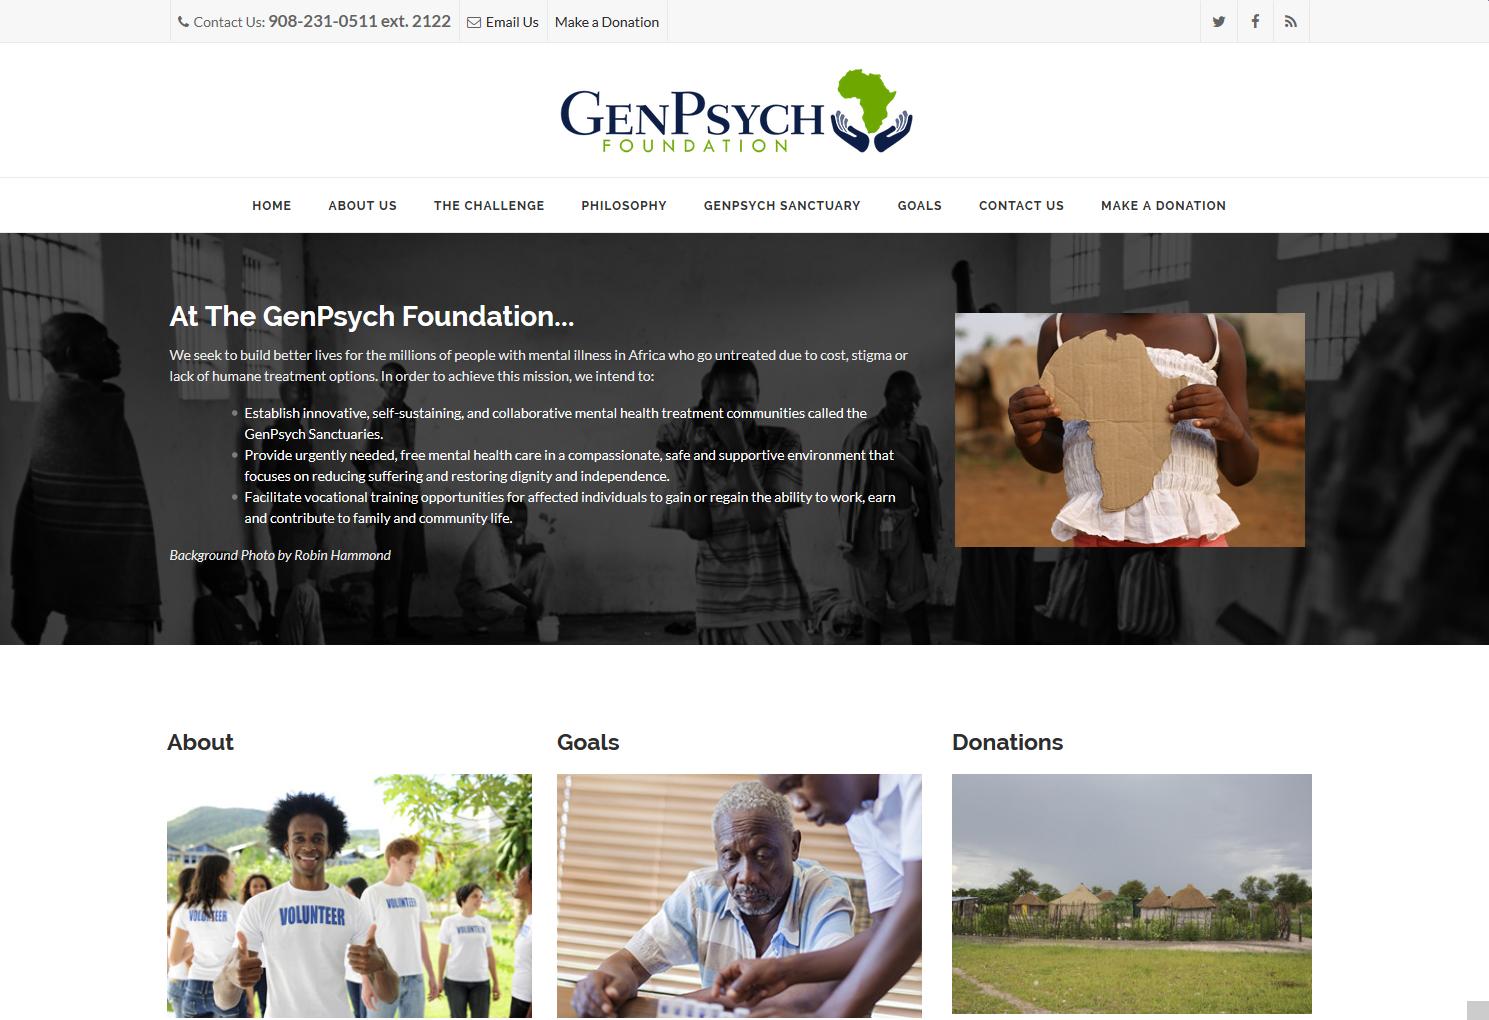 GenPsych Foundation